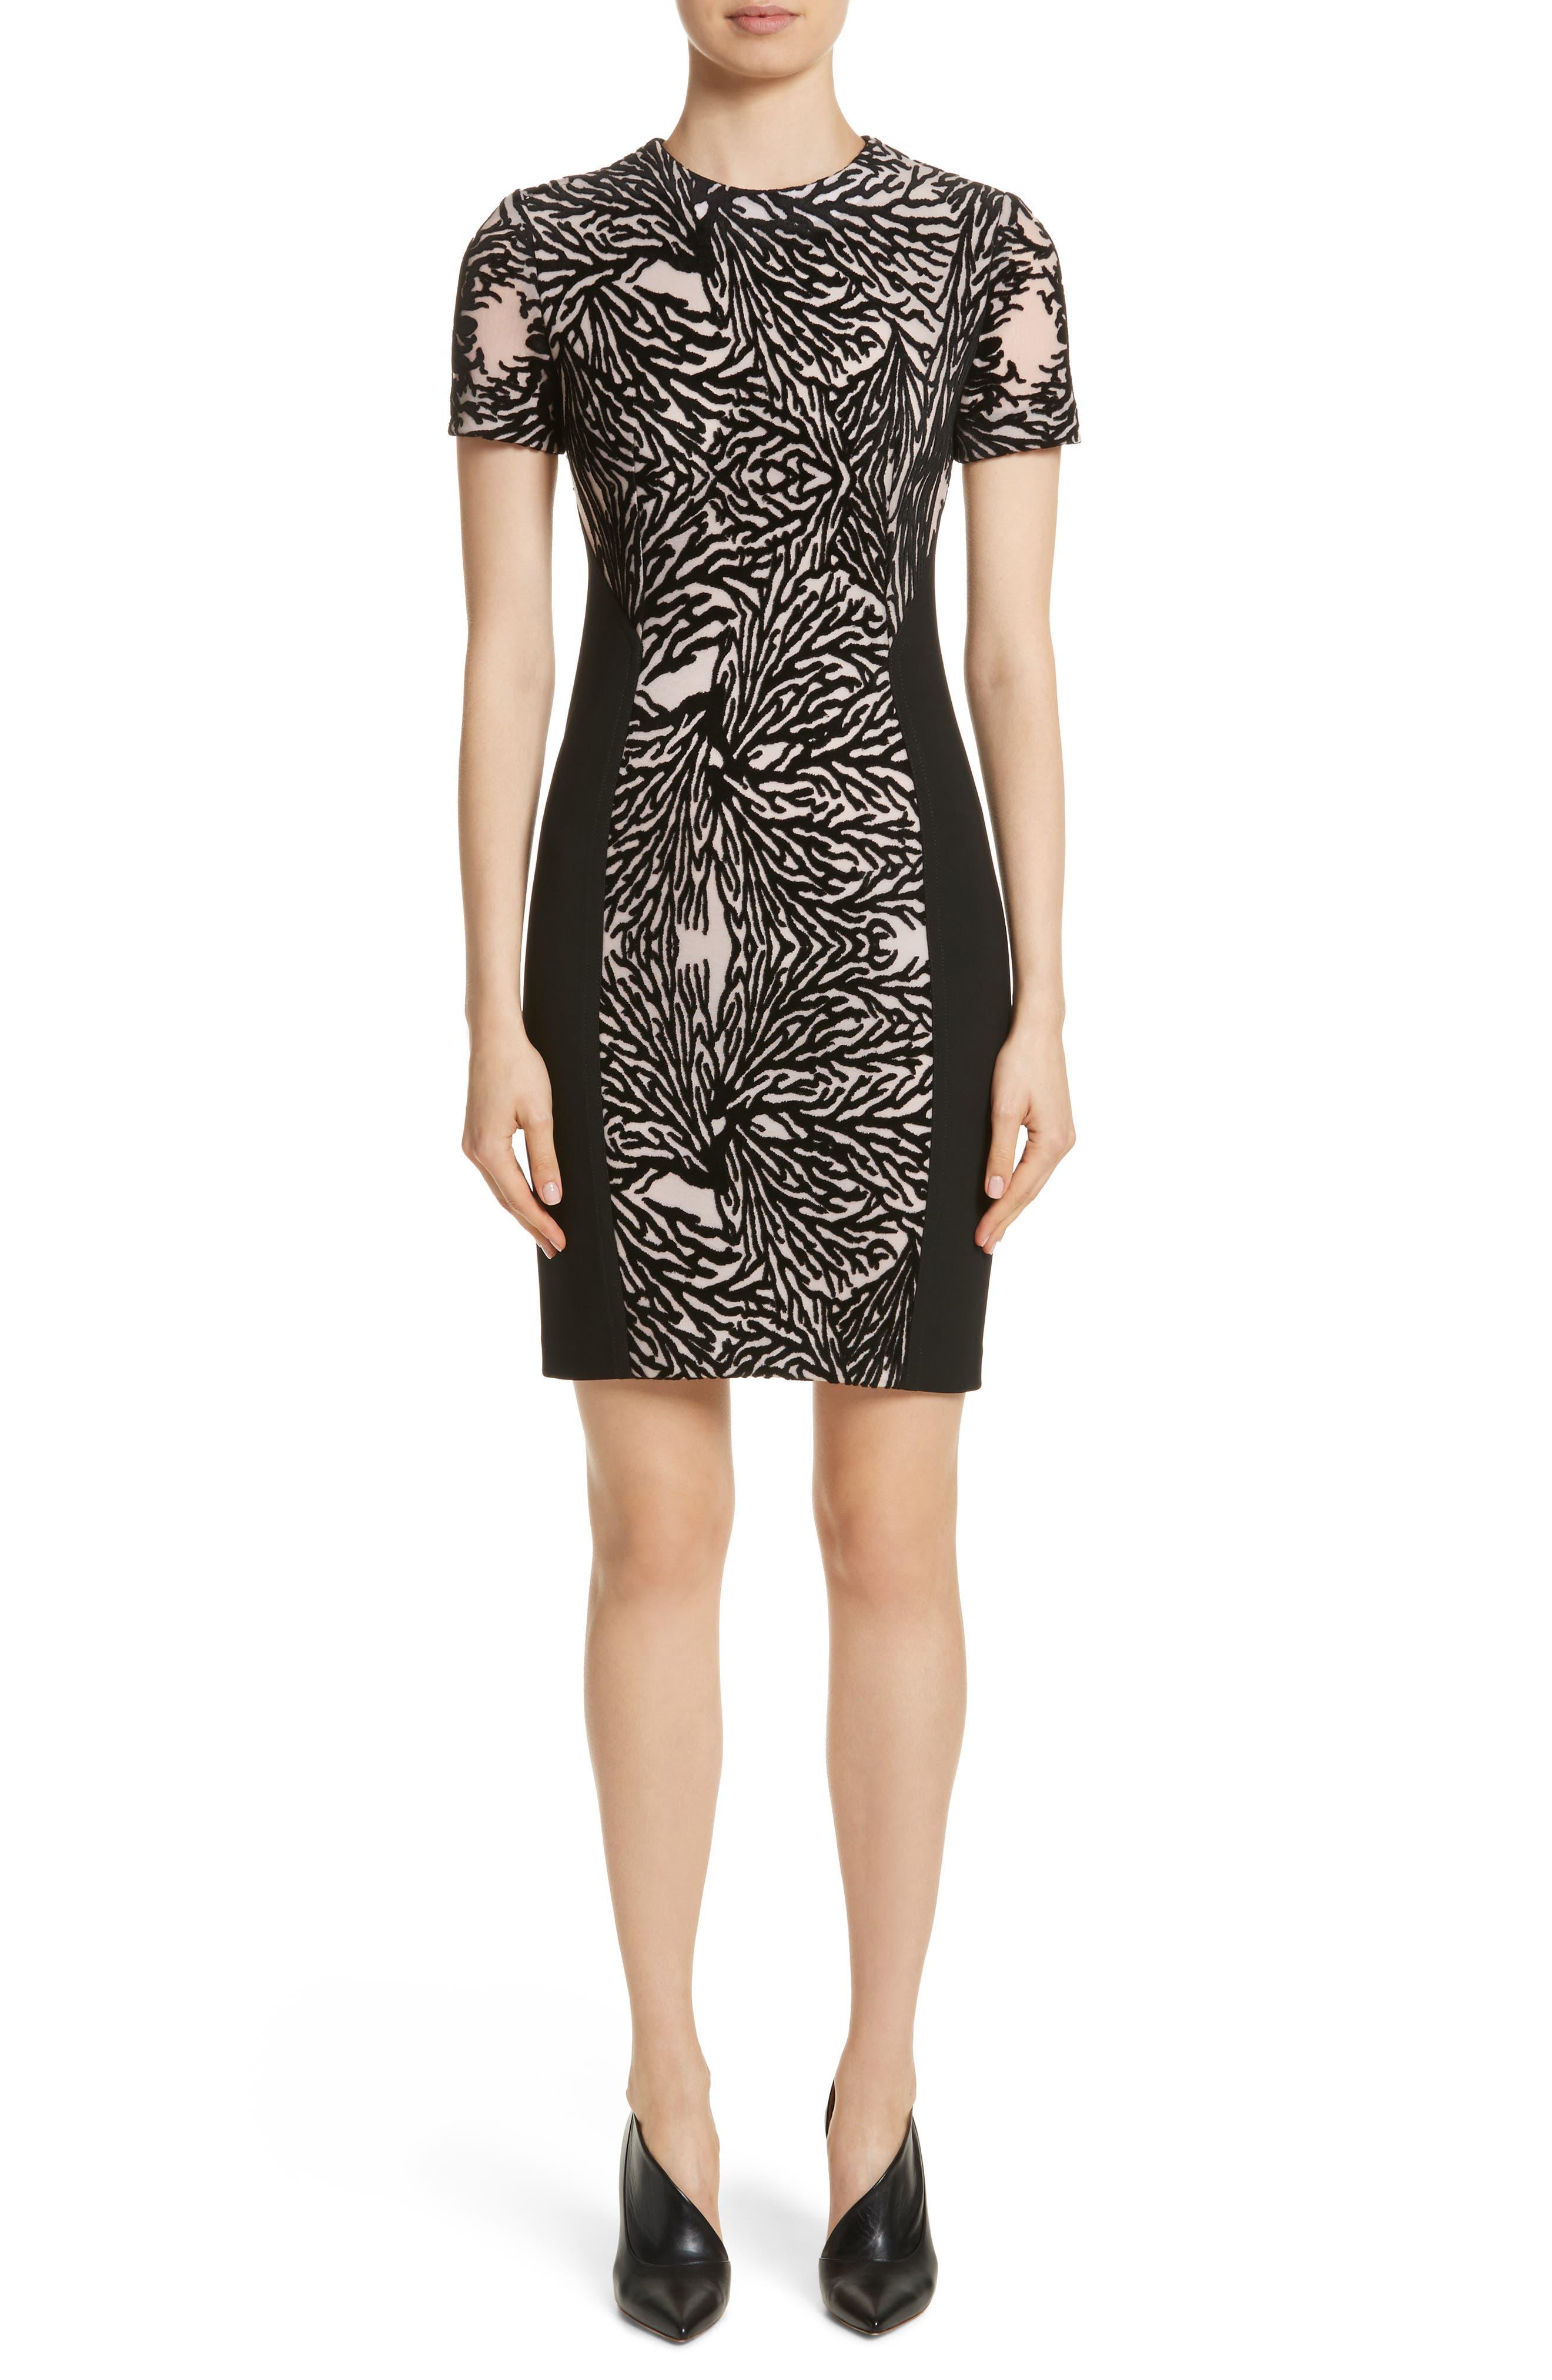 Alternate Image 1 Selected - Yigal Azrouël Burnout Coral Sheath Dress